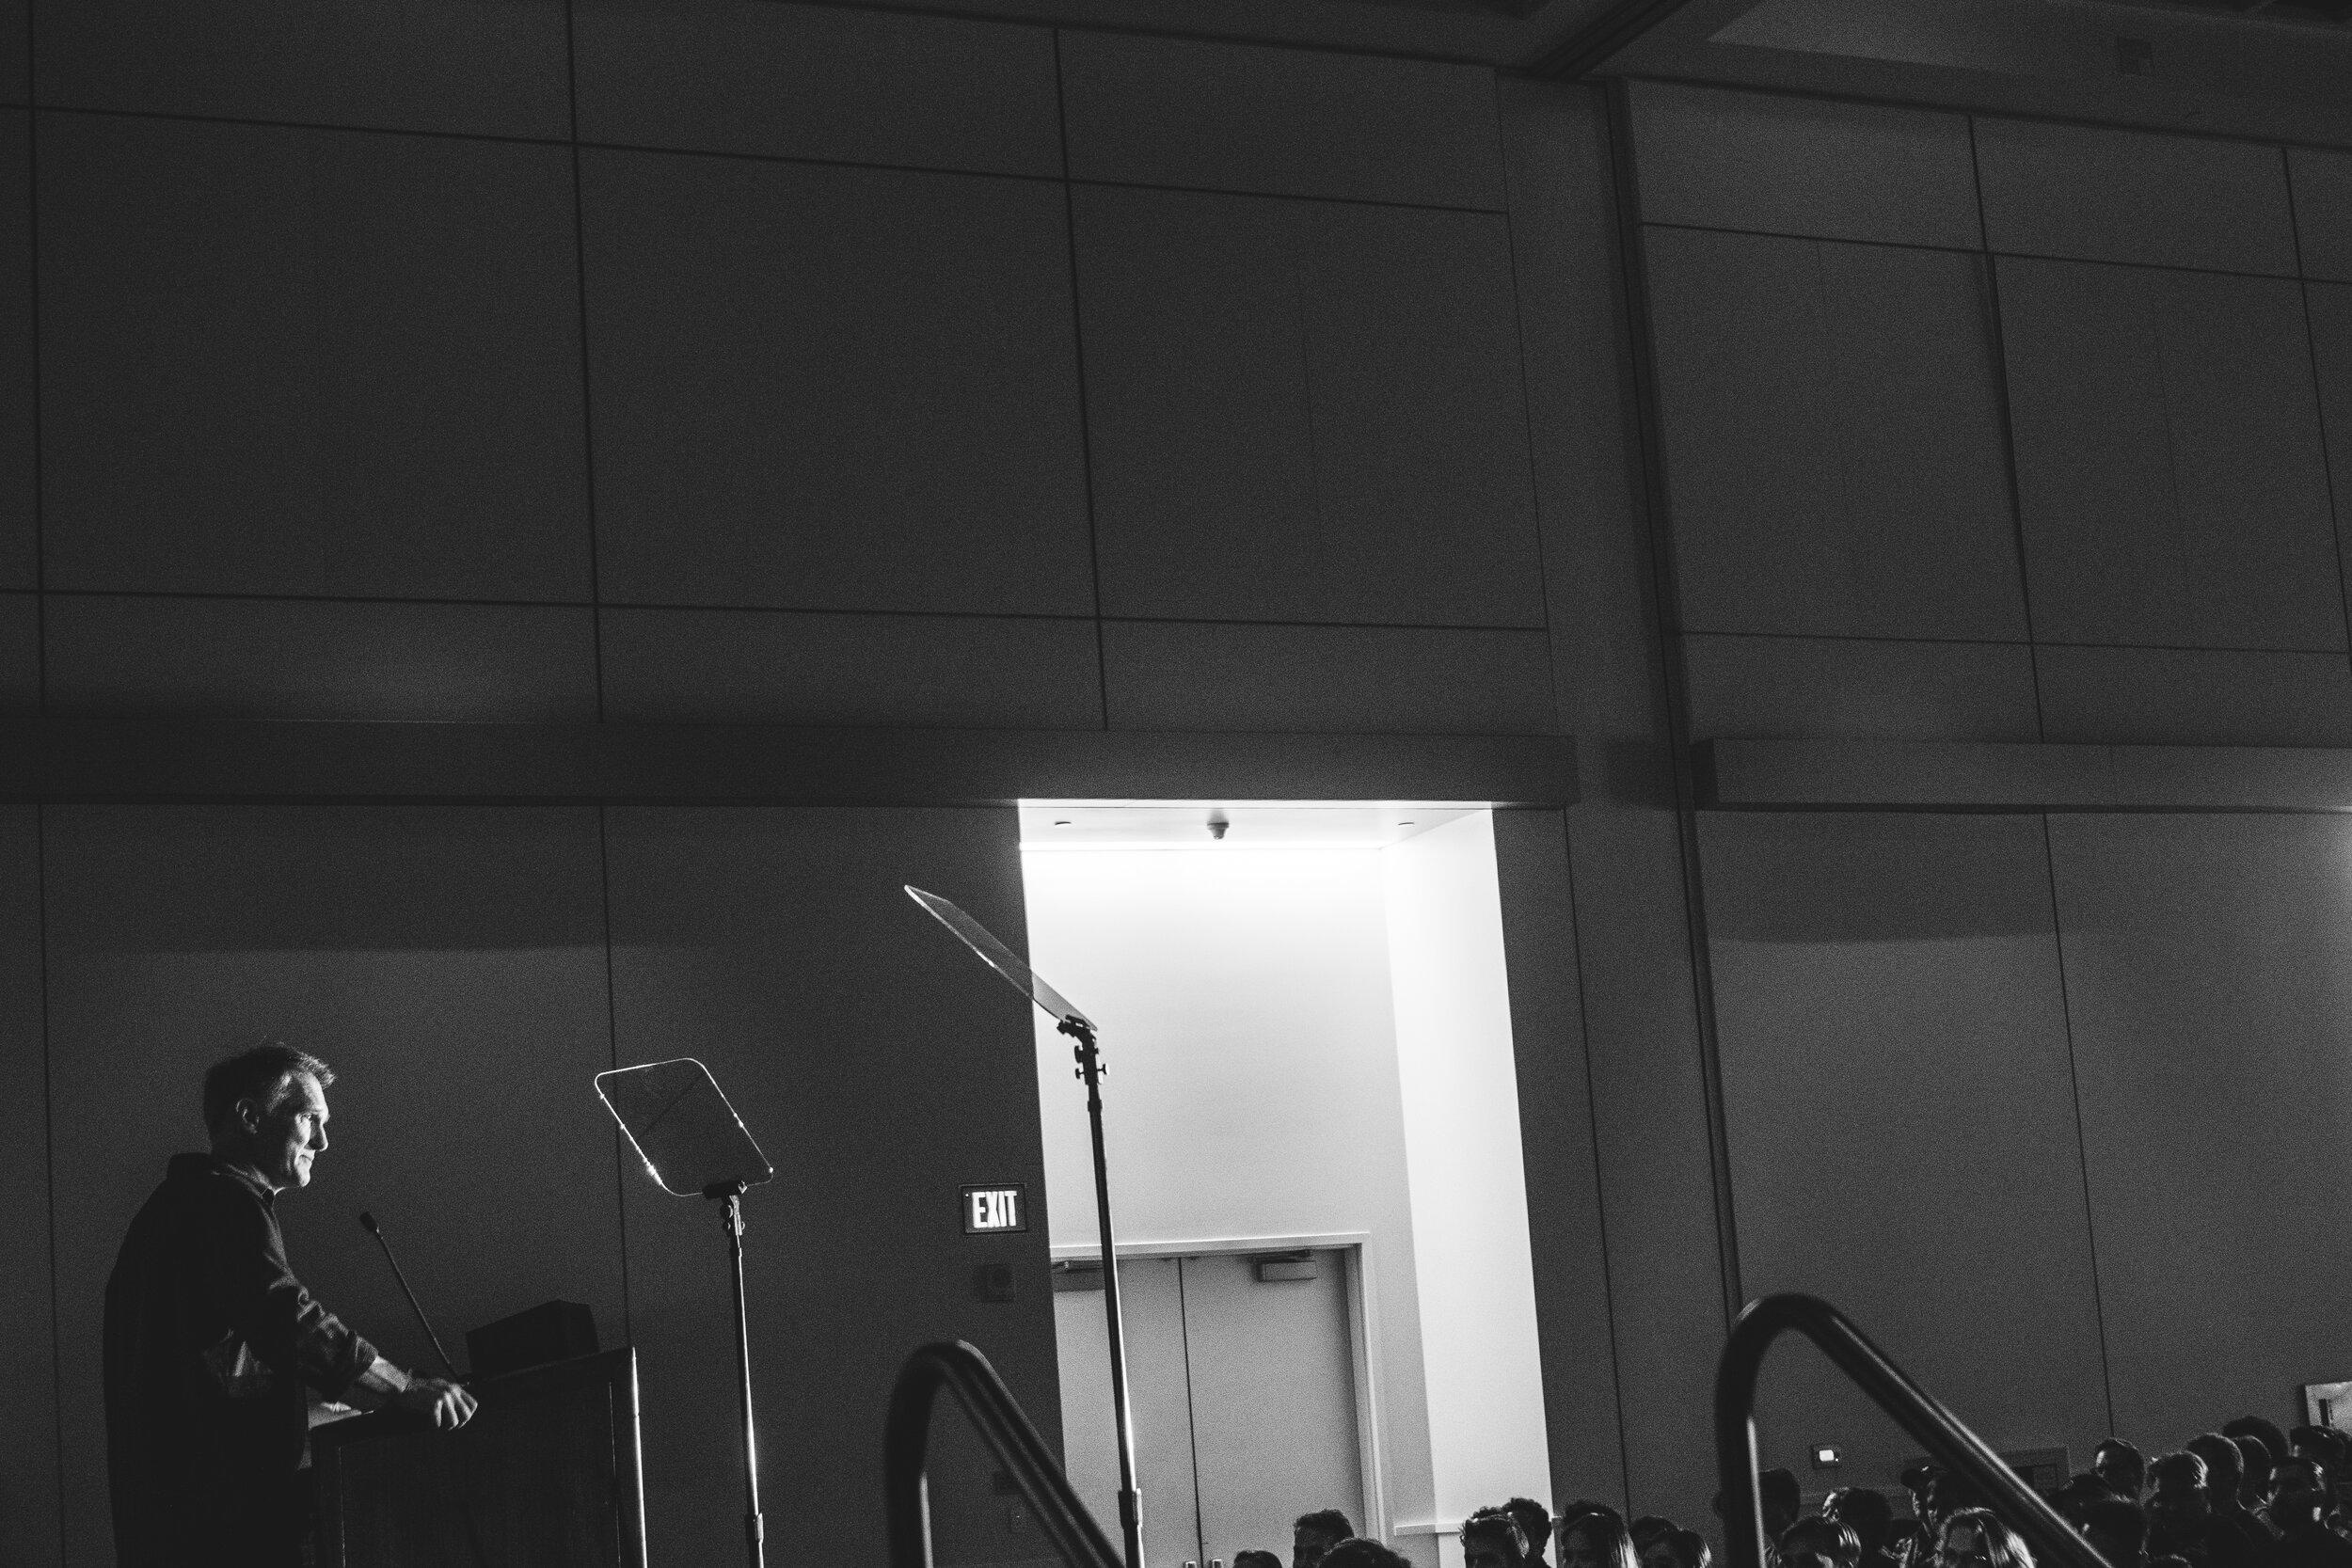 Iain McCaig- Keynote